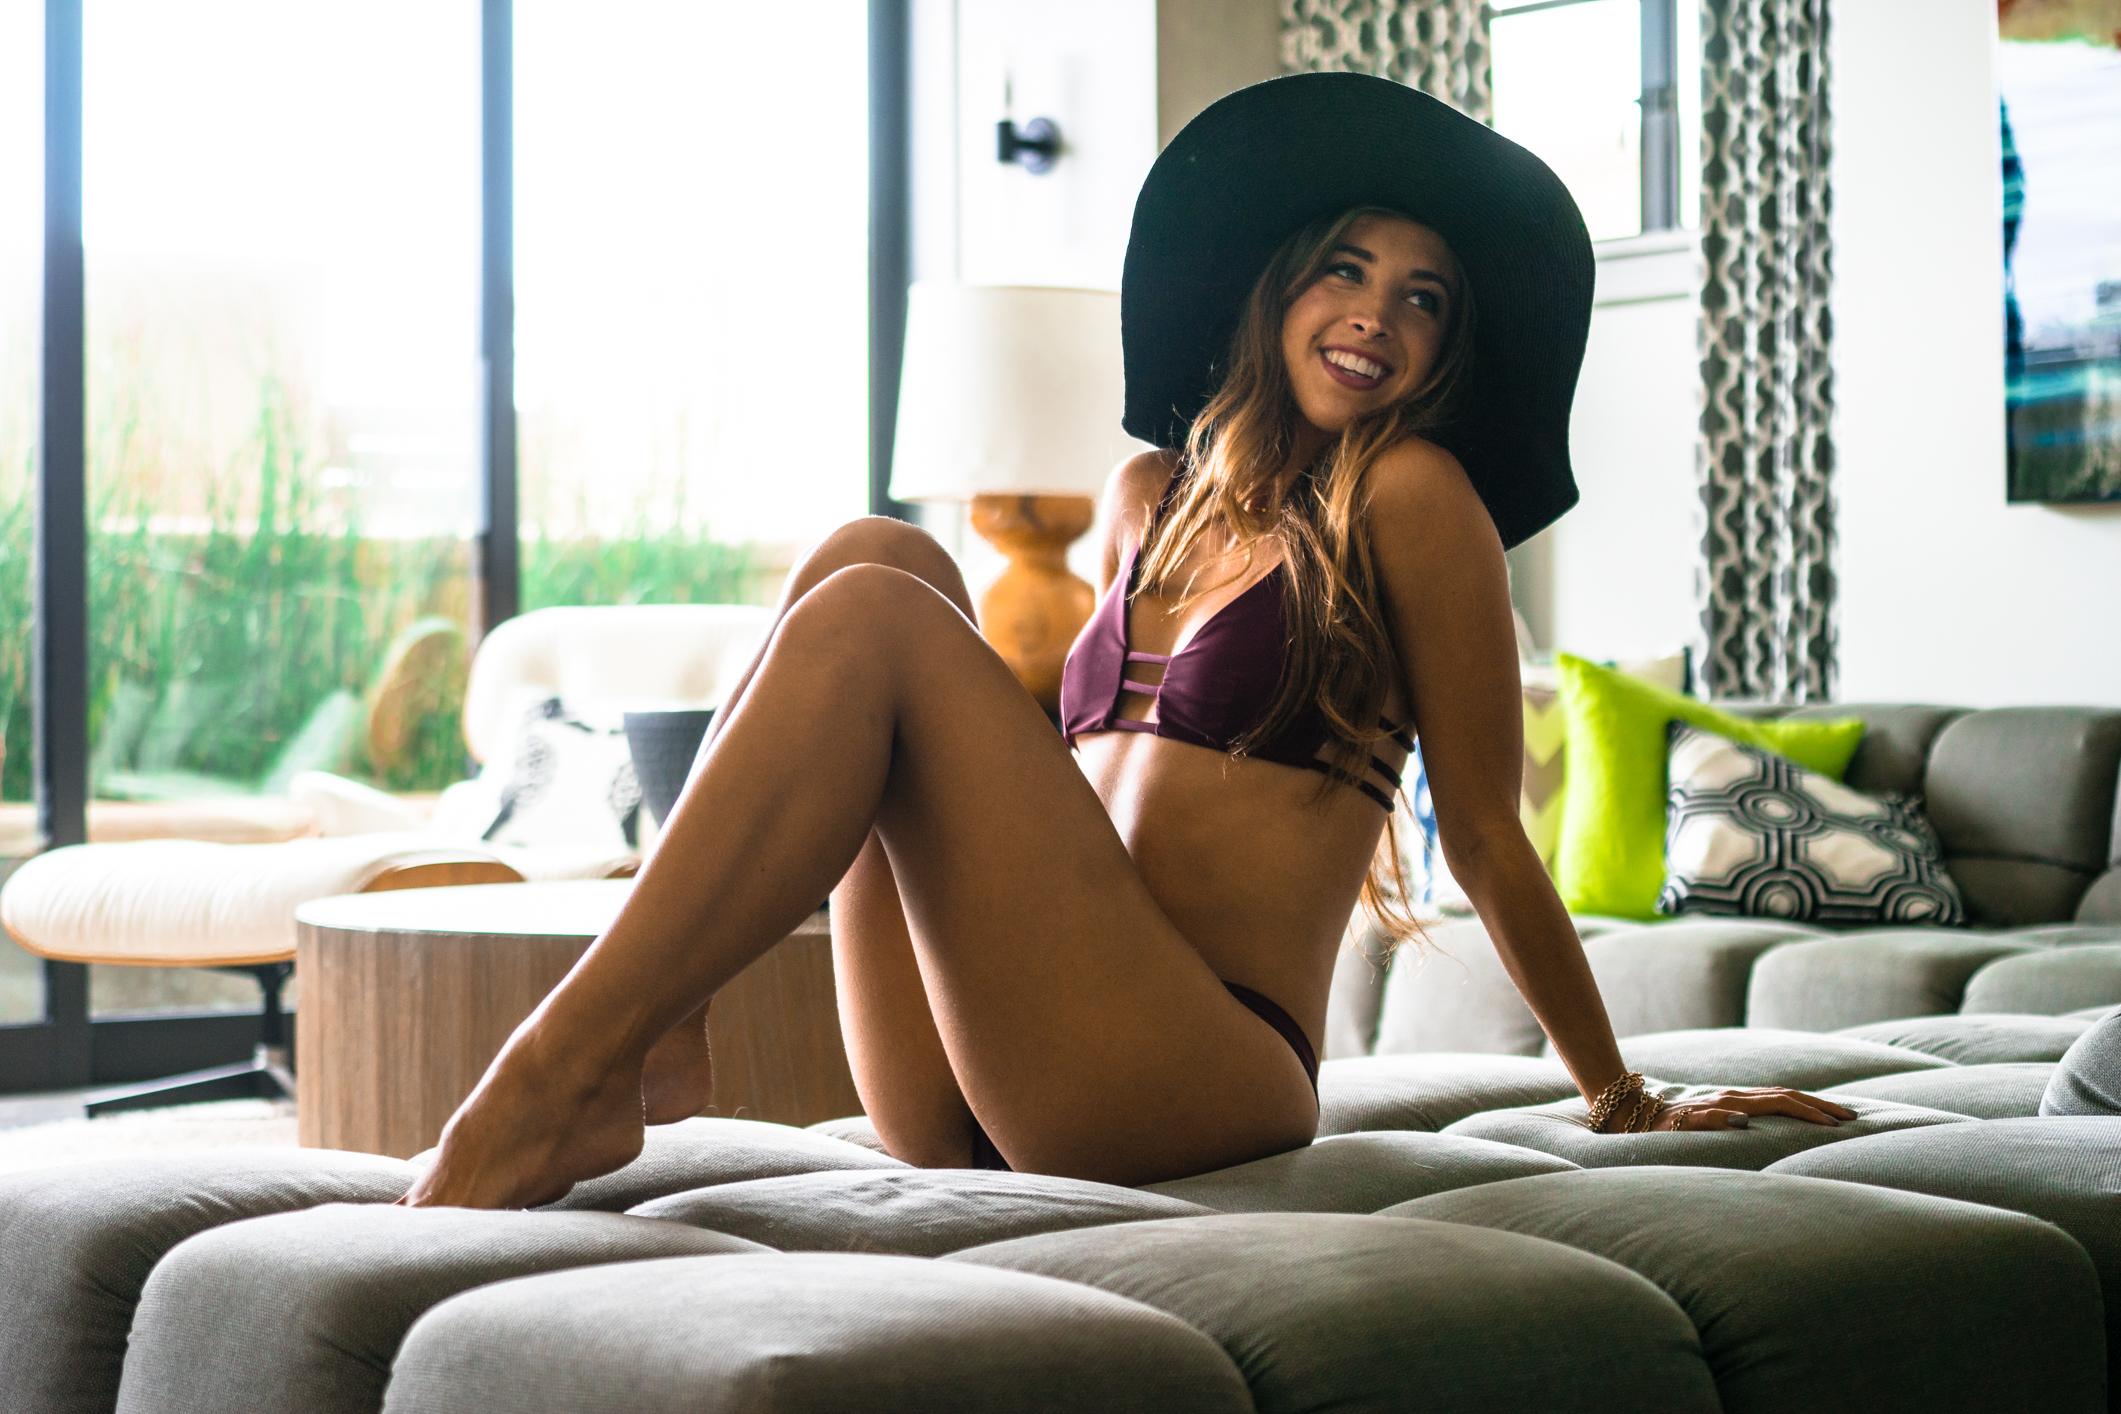 Emma amp miranda - 1 part 6